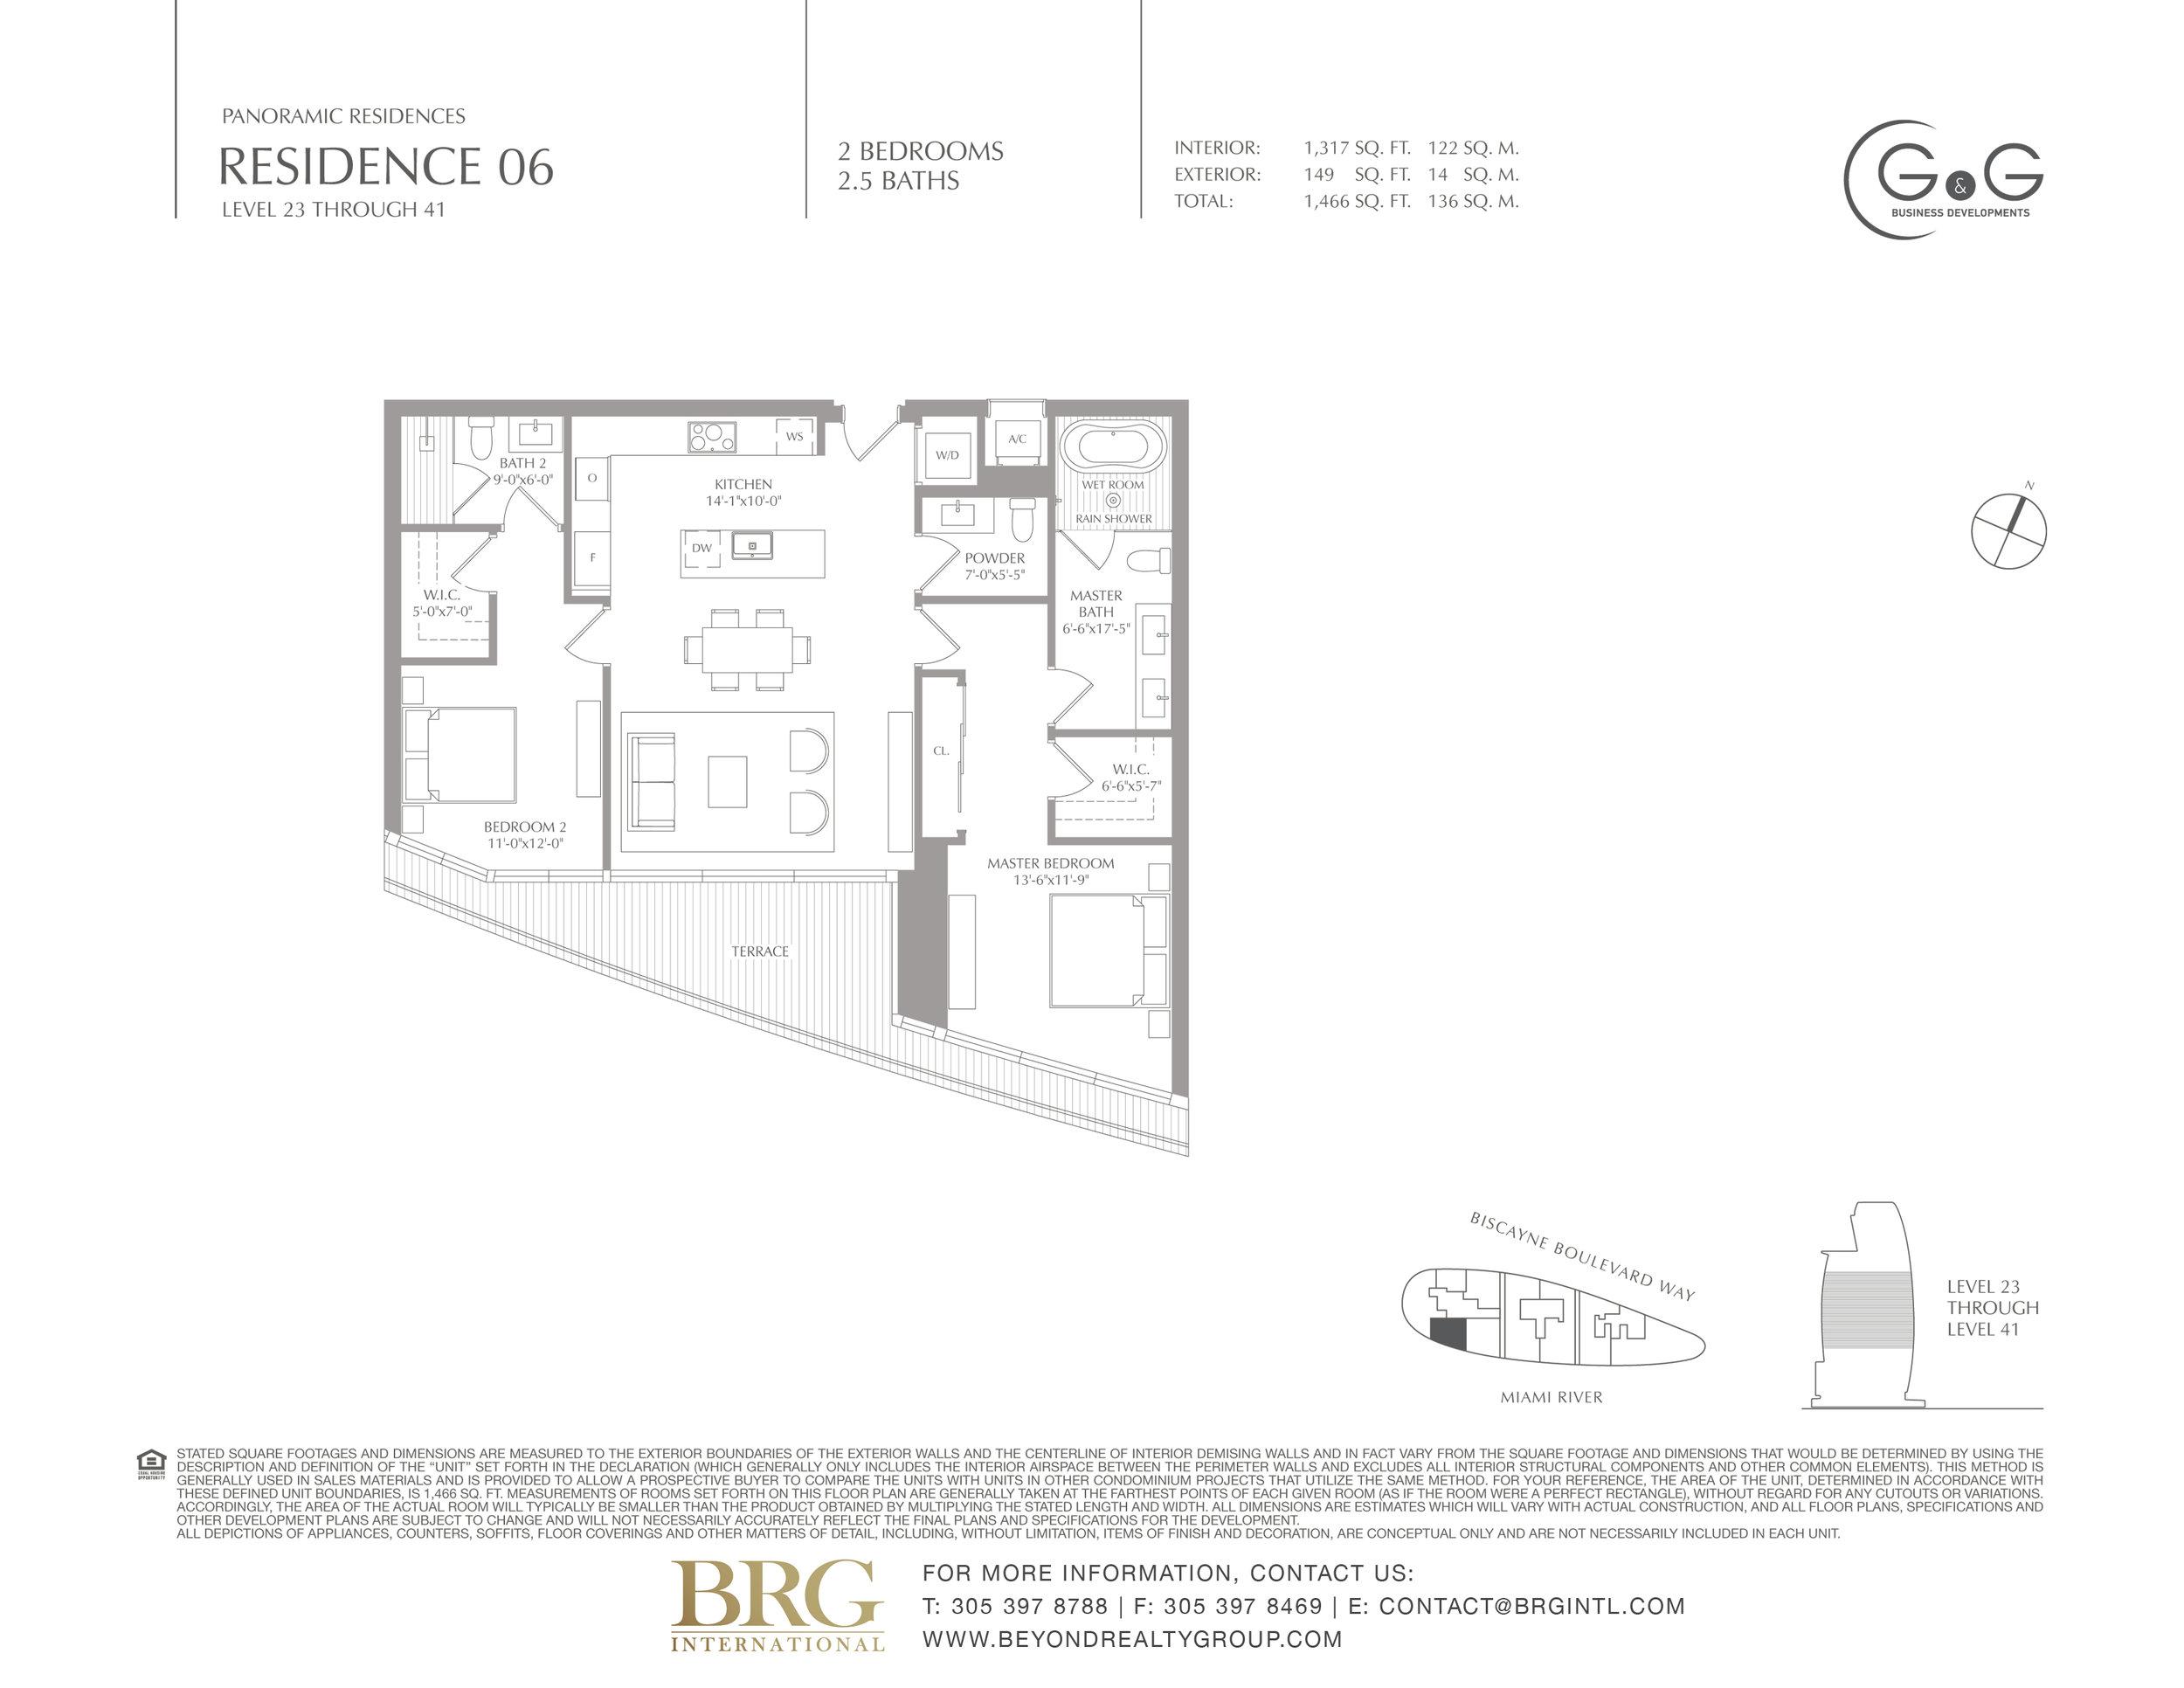 Aston-Martin-Residences-Brochure-18.jpg